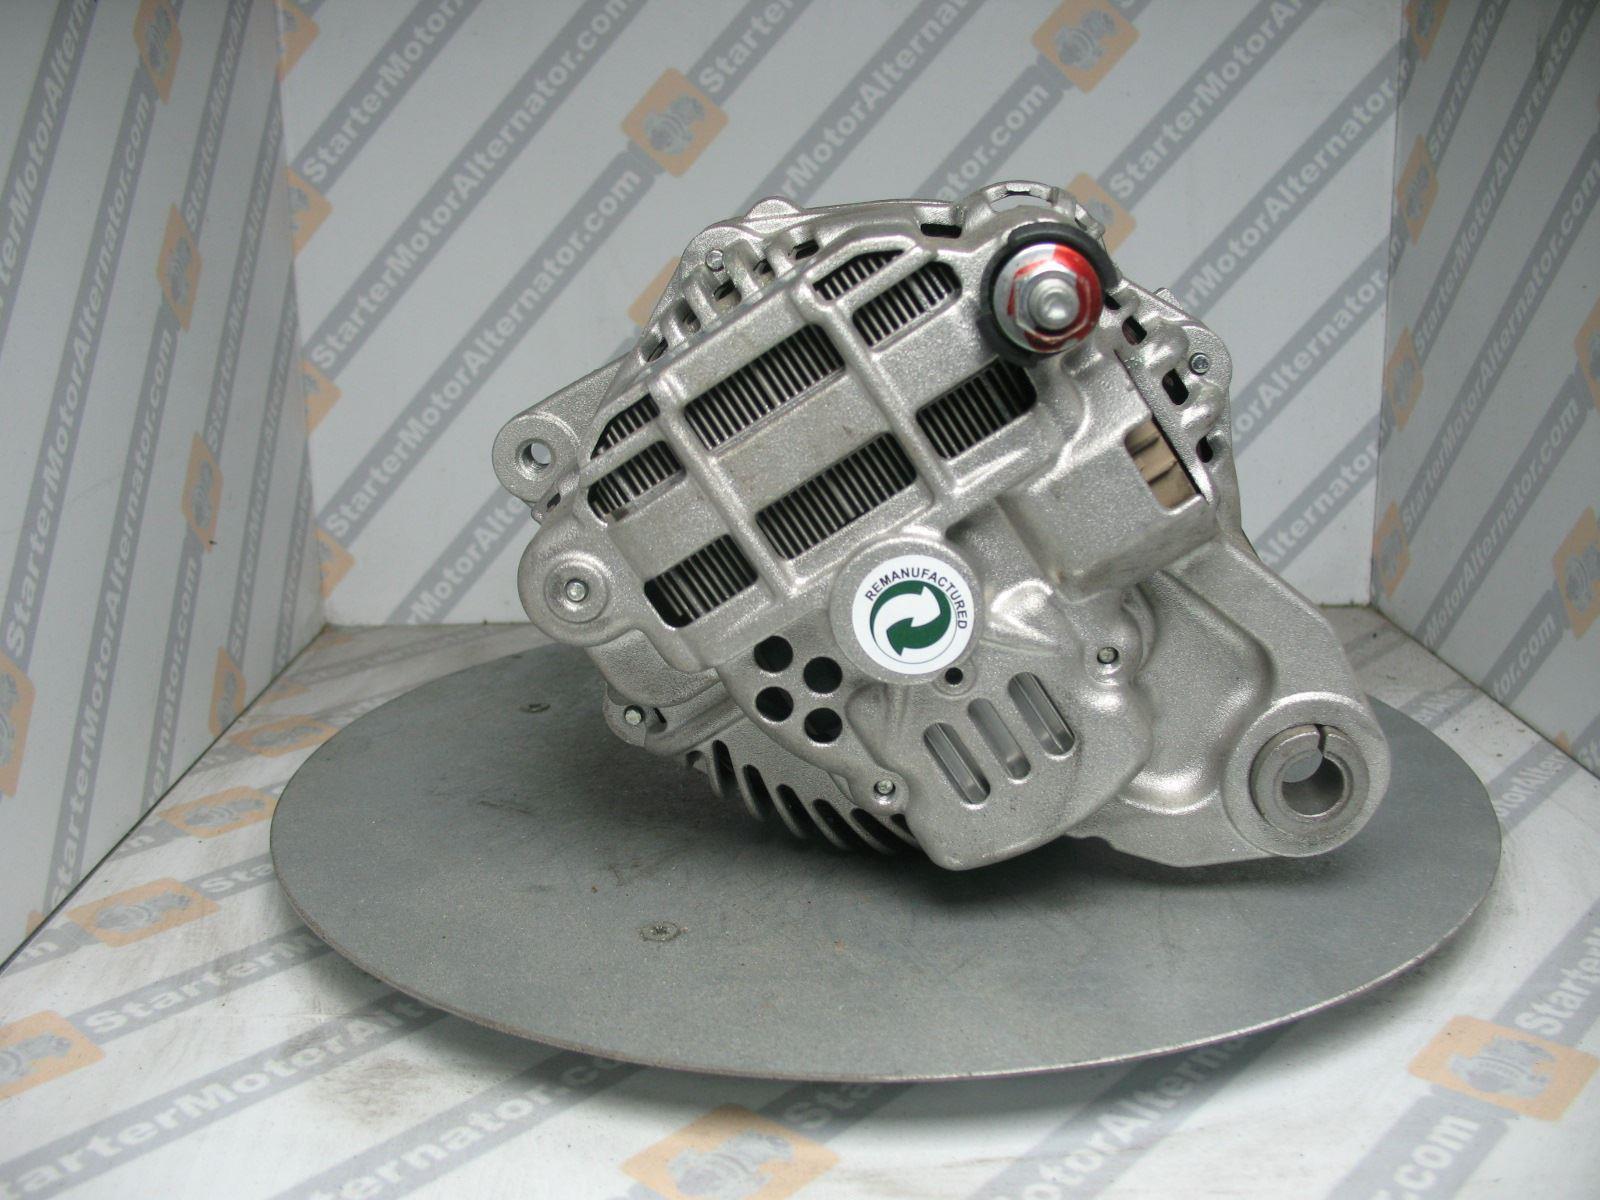 XIK2955 Alternator For Mitsubishi